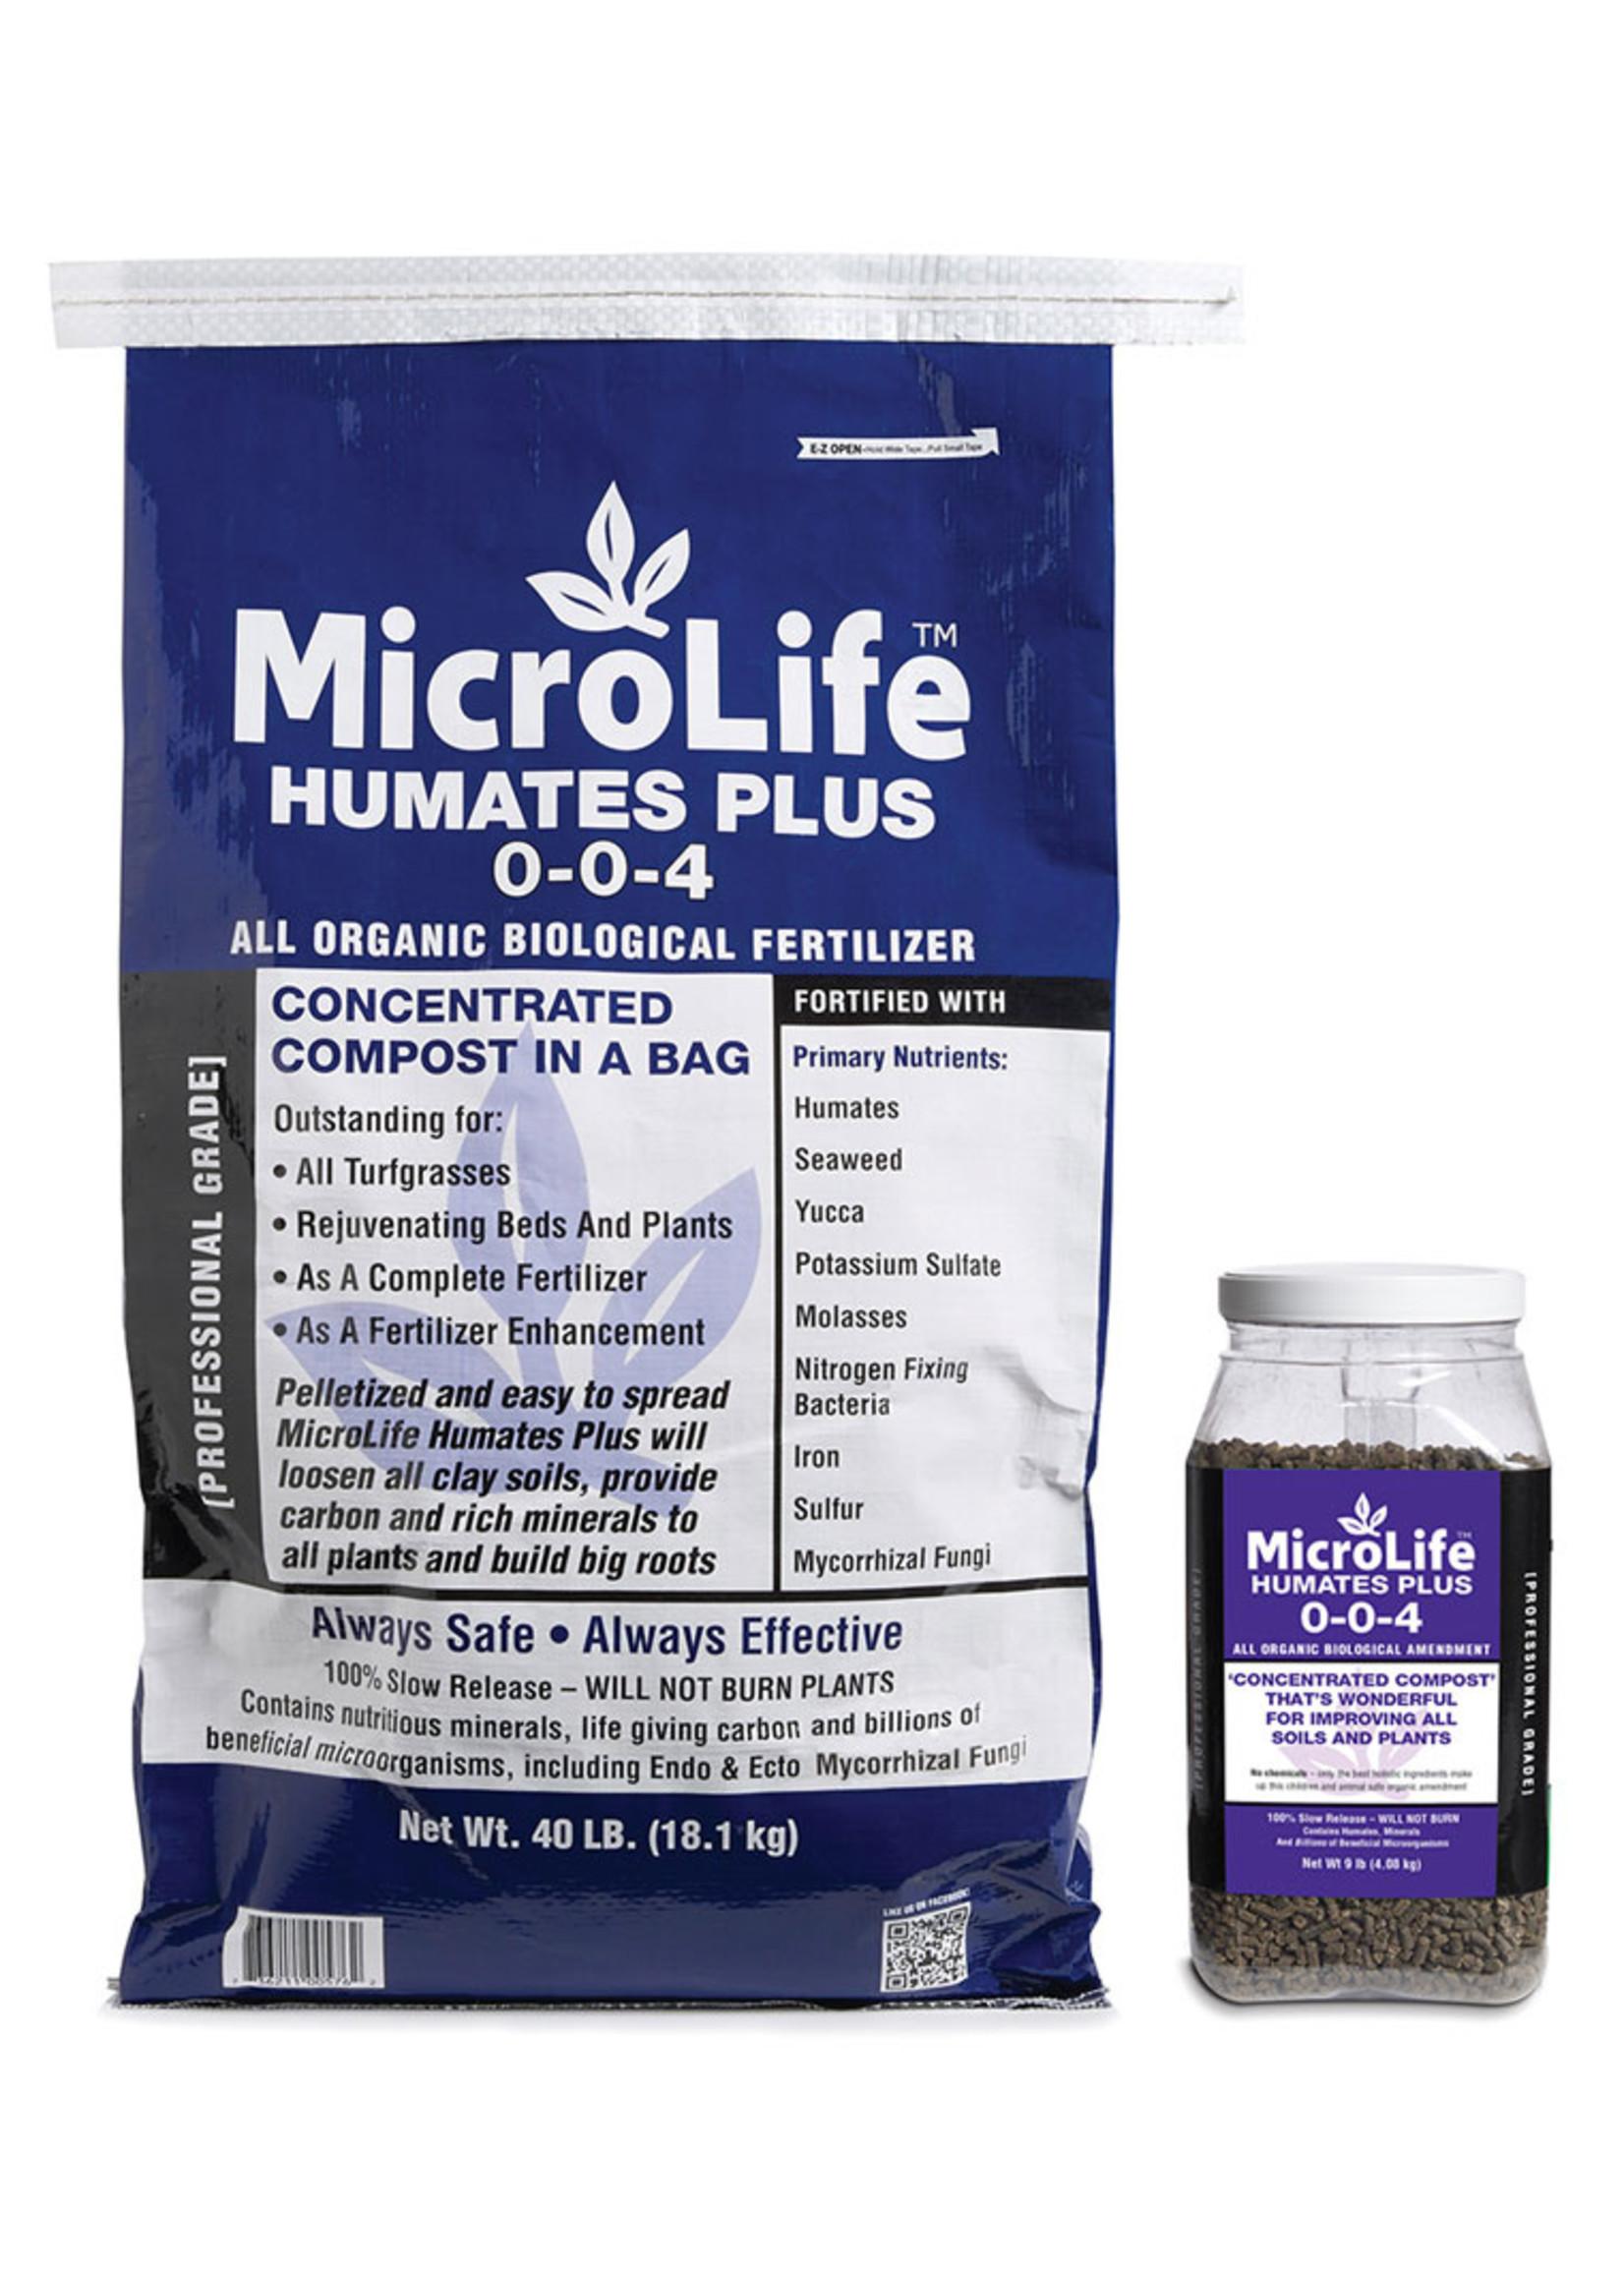 BAG MicroLife Humates Plus 40 lb. bag